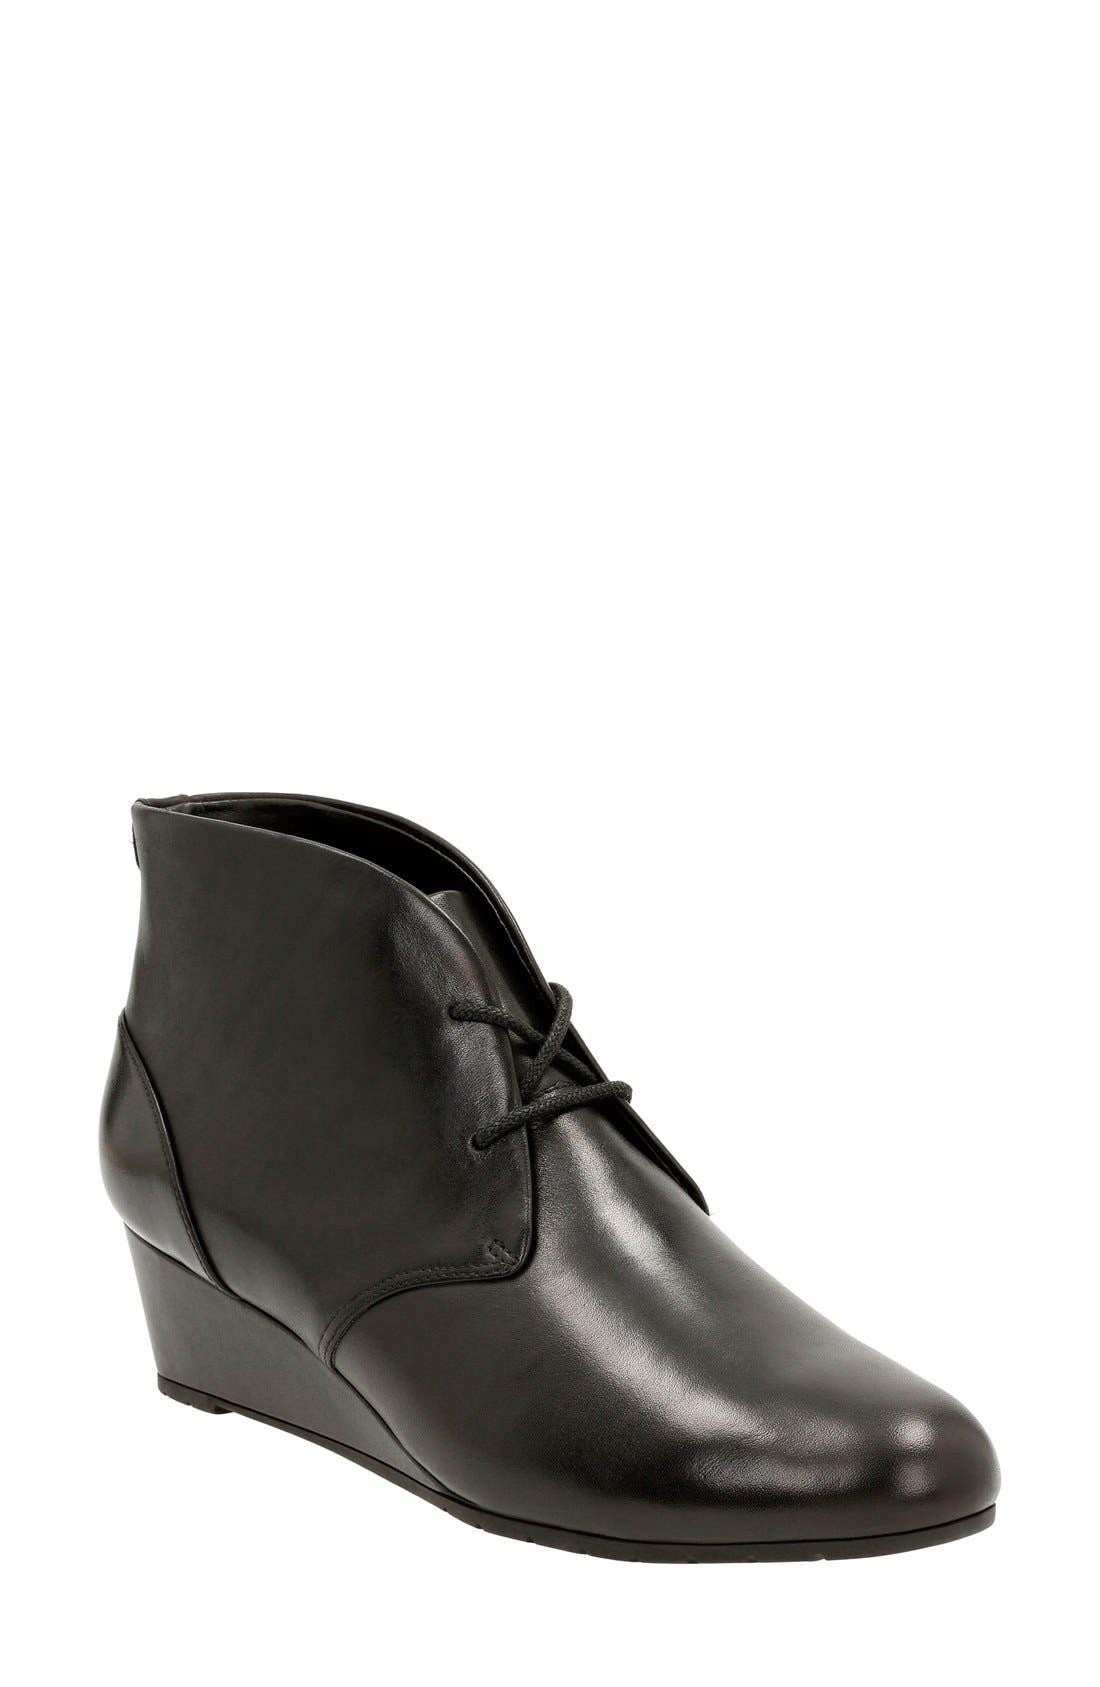 'Vendra Peak' Wedge Boot,                             Main thumbnail 1, color,                             Black Leather